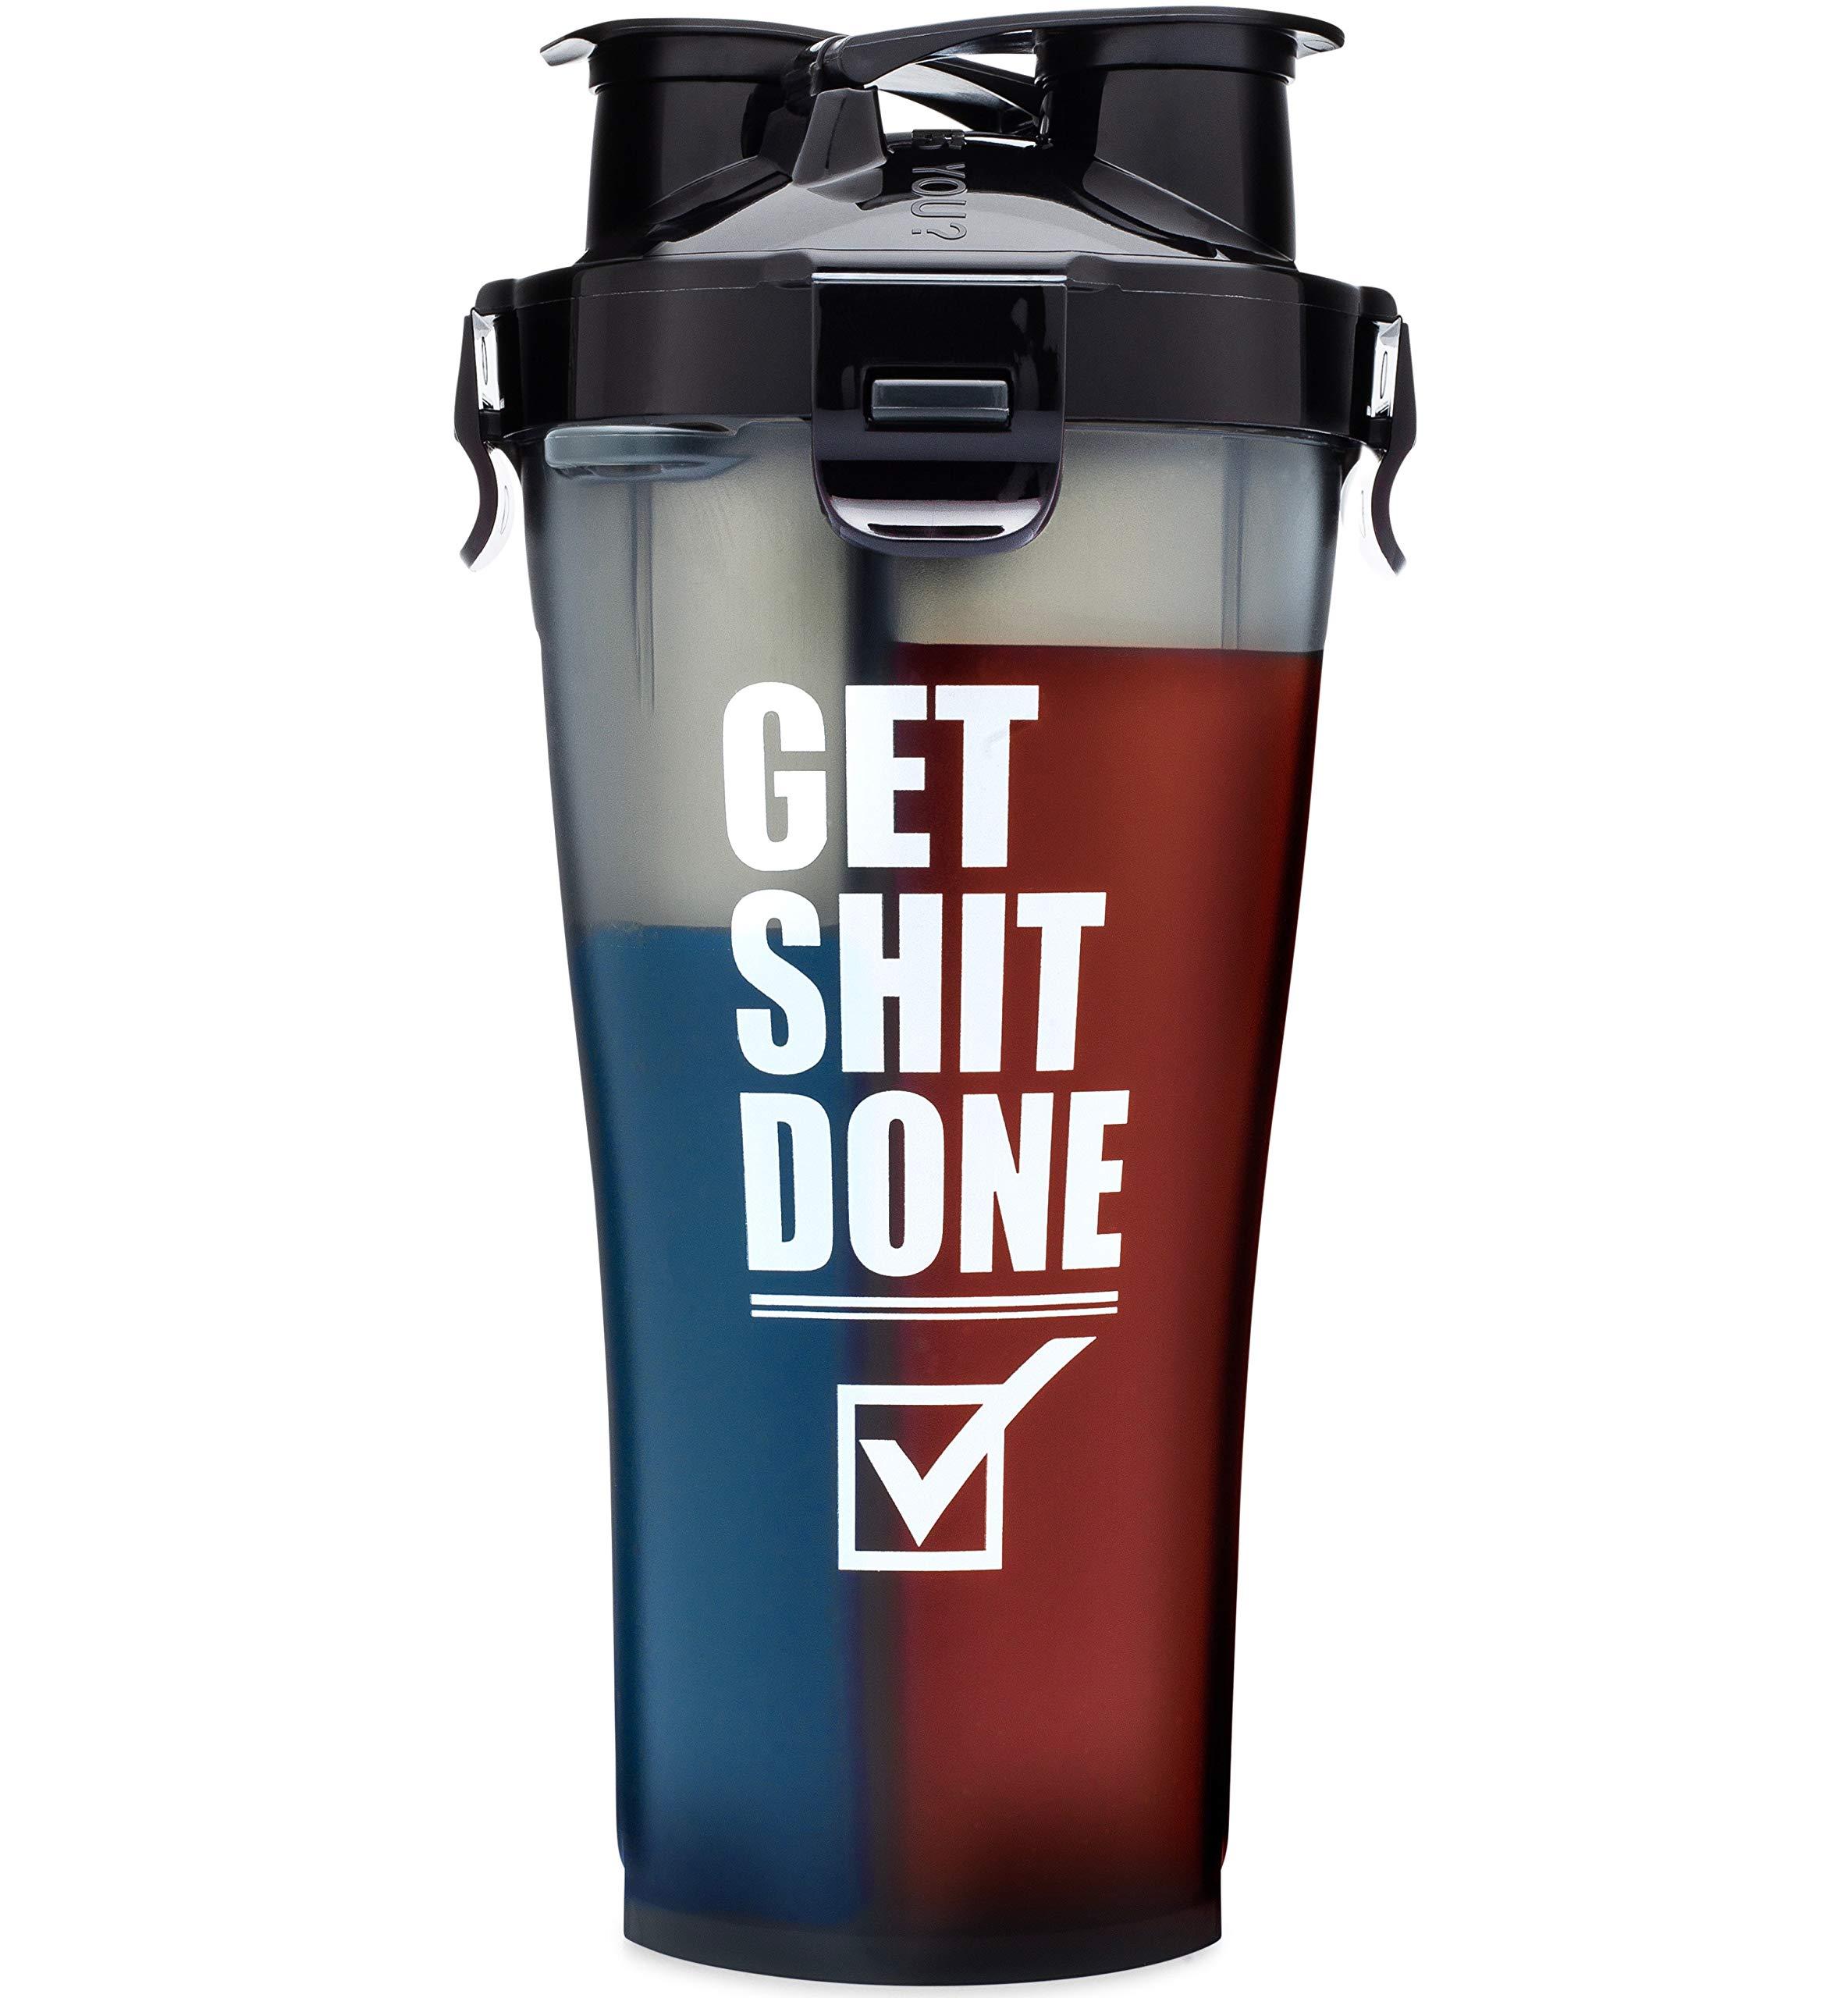 Amazon.com: Hydra Cup Dual Threat - Protein & Pre Shaker